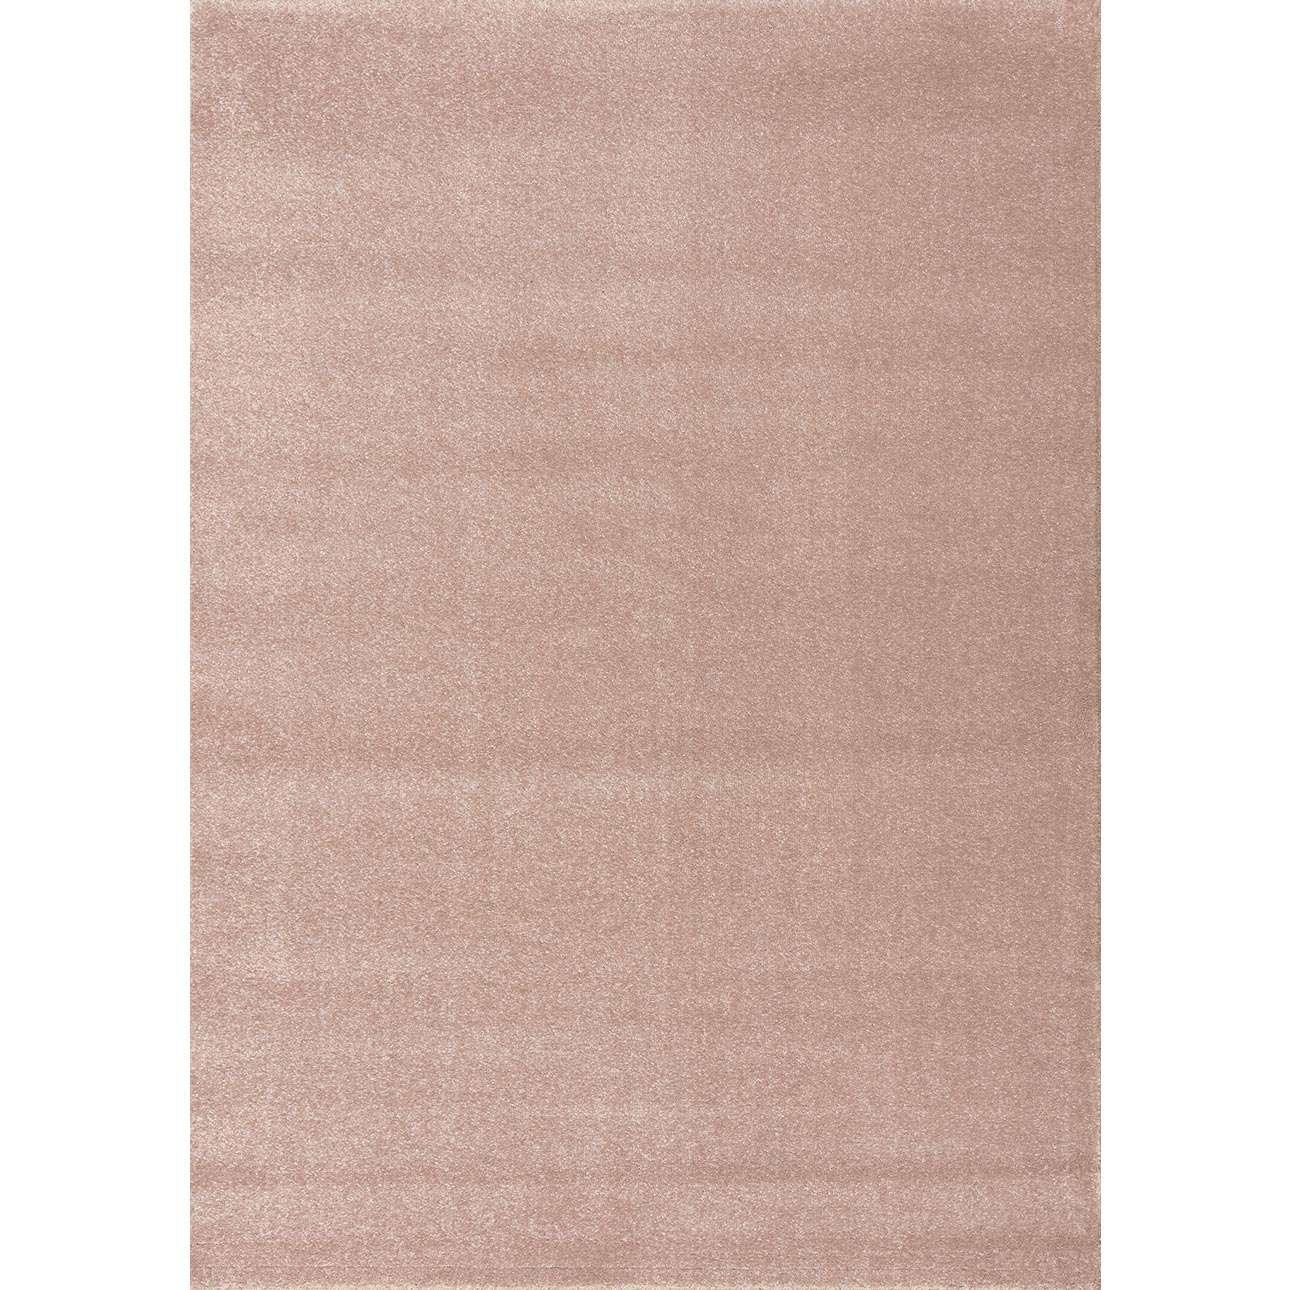 Dywan Sevilla dusty rose 120x170cm